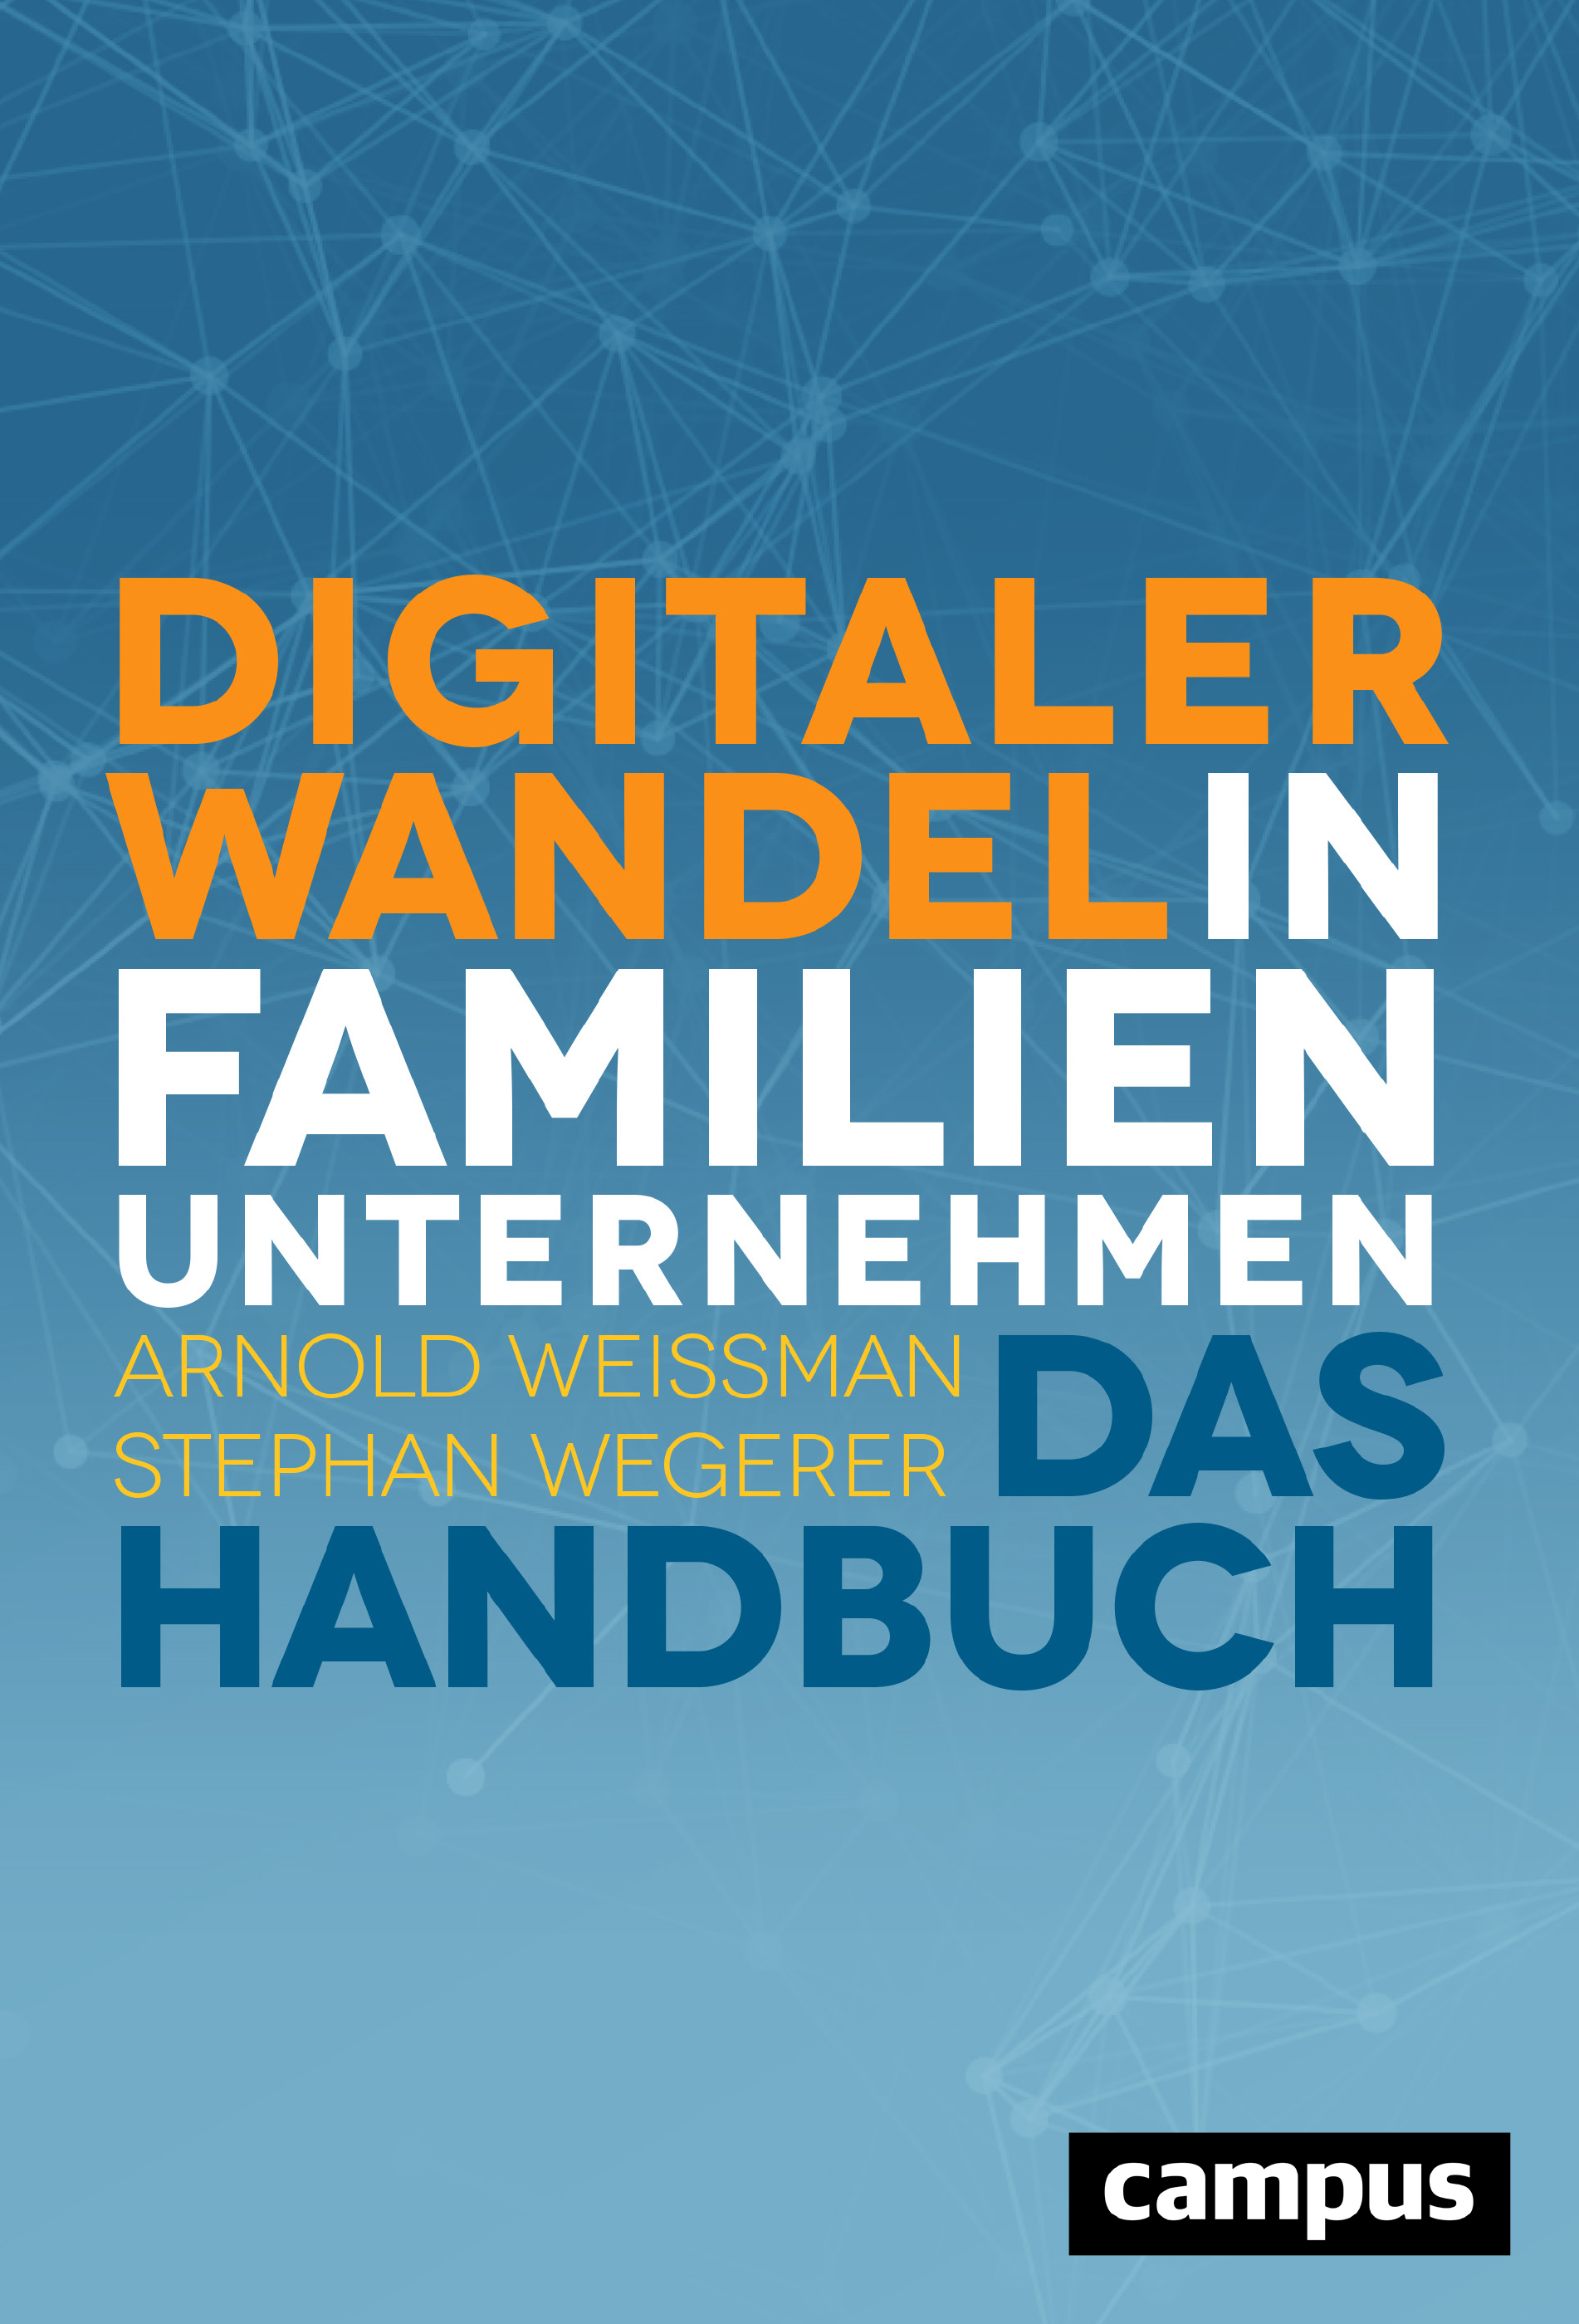 Expert Marketplace -  Prof. Dr.   Arnold   Weissman  -  Digitaler Wandel in Familienunternehmen